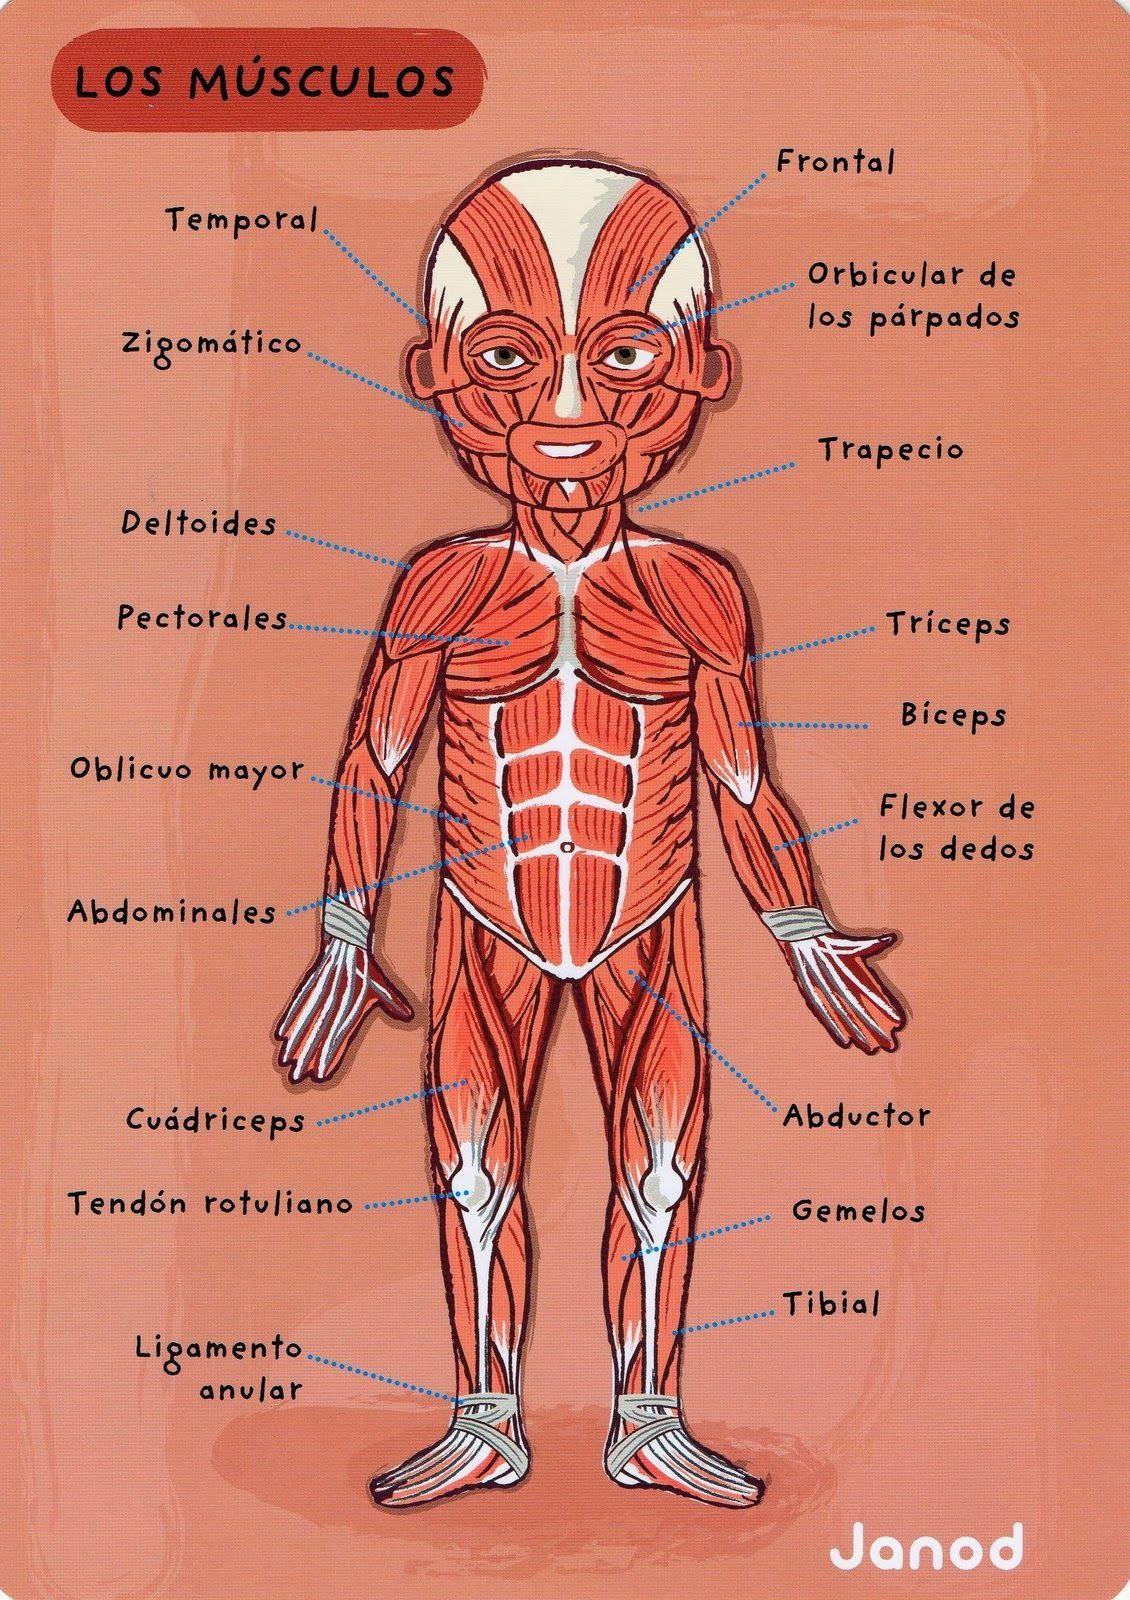 cuerpo-humano-musculos.jpg 1,130×1,600 píxeles   Dibujo   Pinterest ...